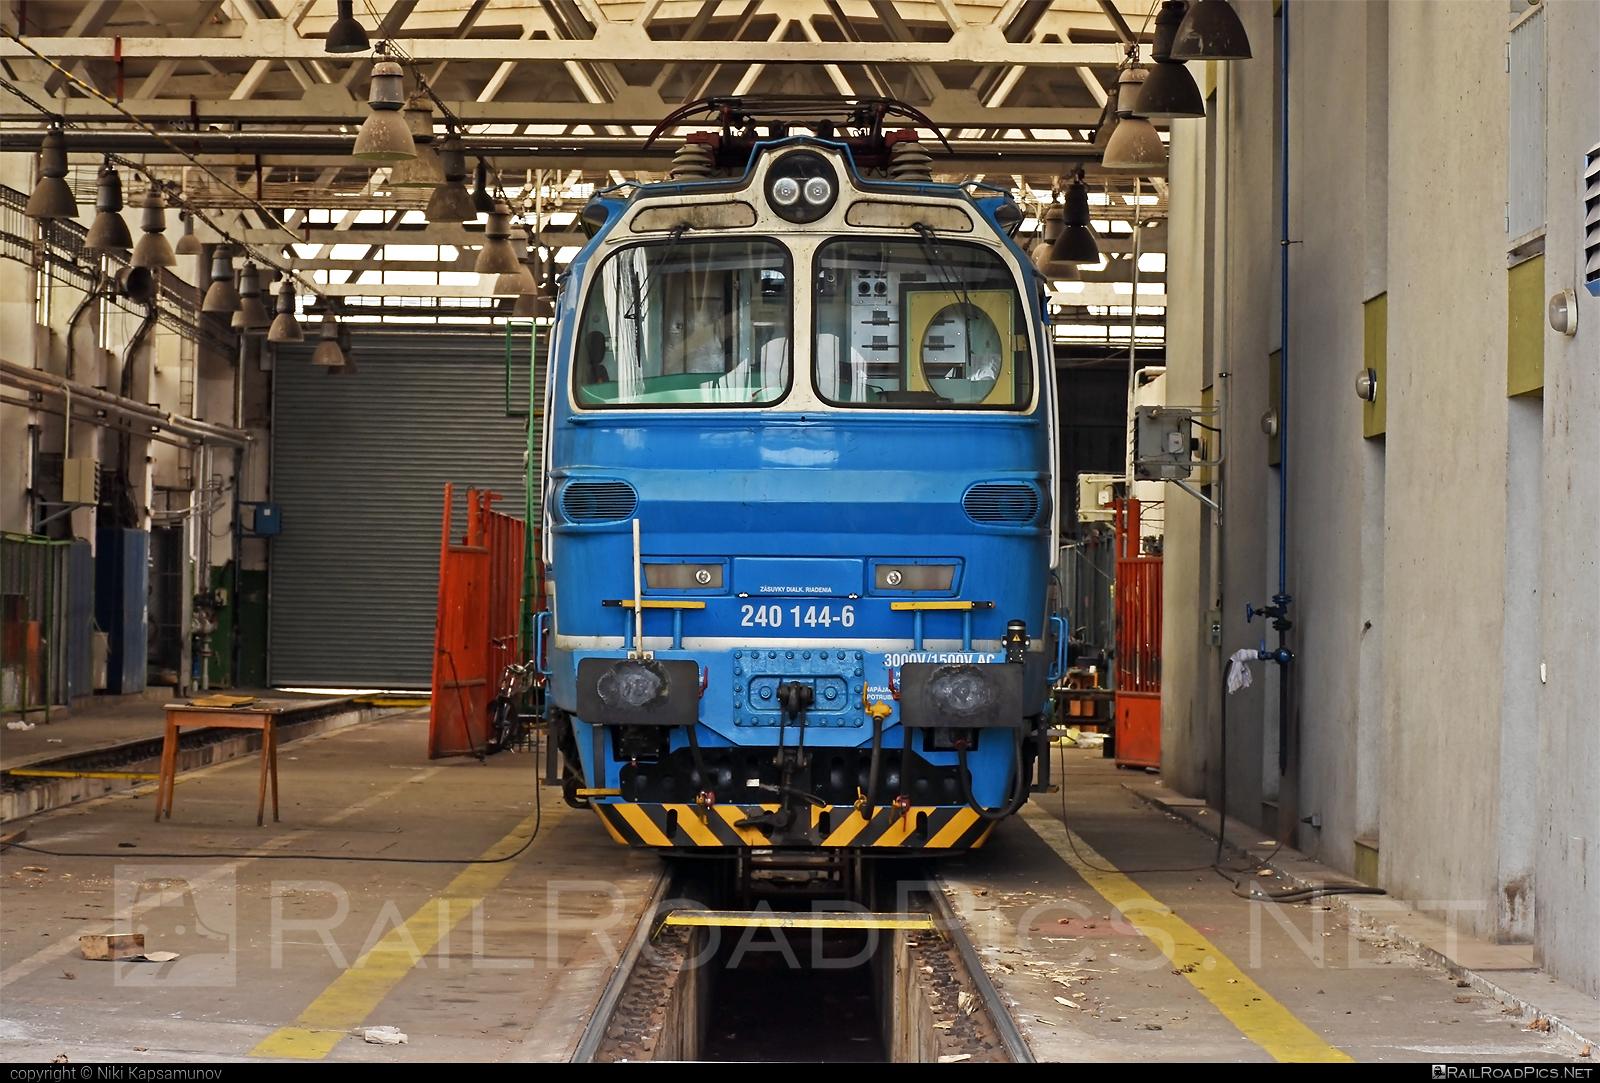 Škoda 47E - 240 144-6 operated by Railtrans International, s.r.o #RailtransInternational #laminatka #locomotive240 #rti #skoda #skoda47e